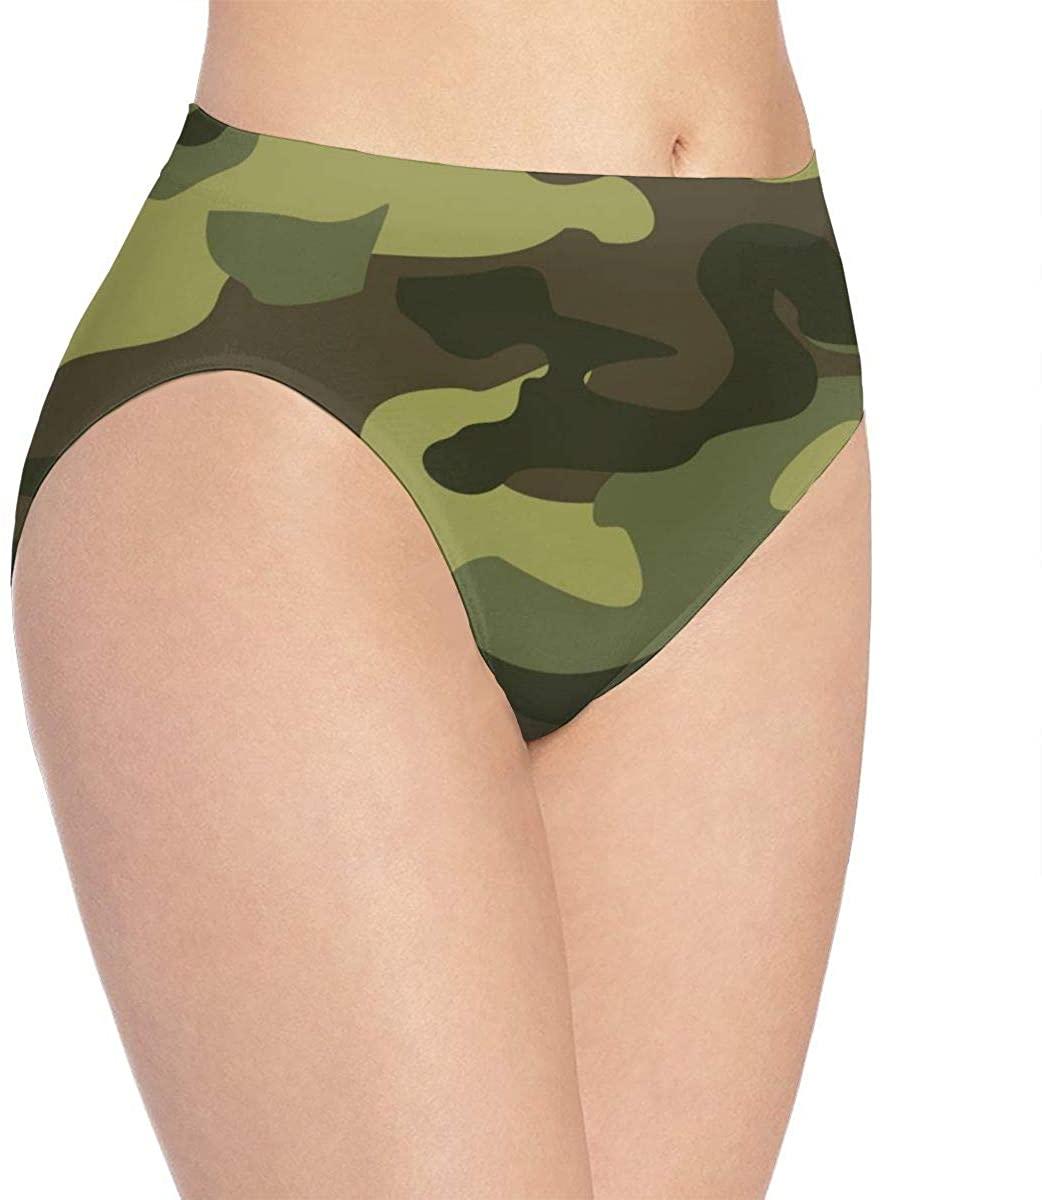 Womens Seamless Underwear Watercolor Floral Bikini Panties Stretch Briefs Laser Cut